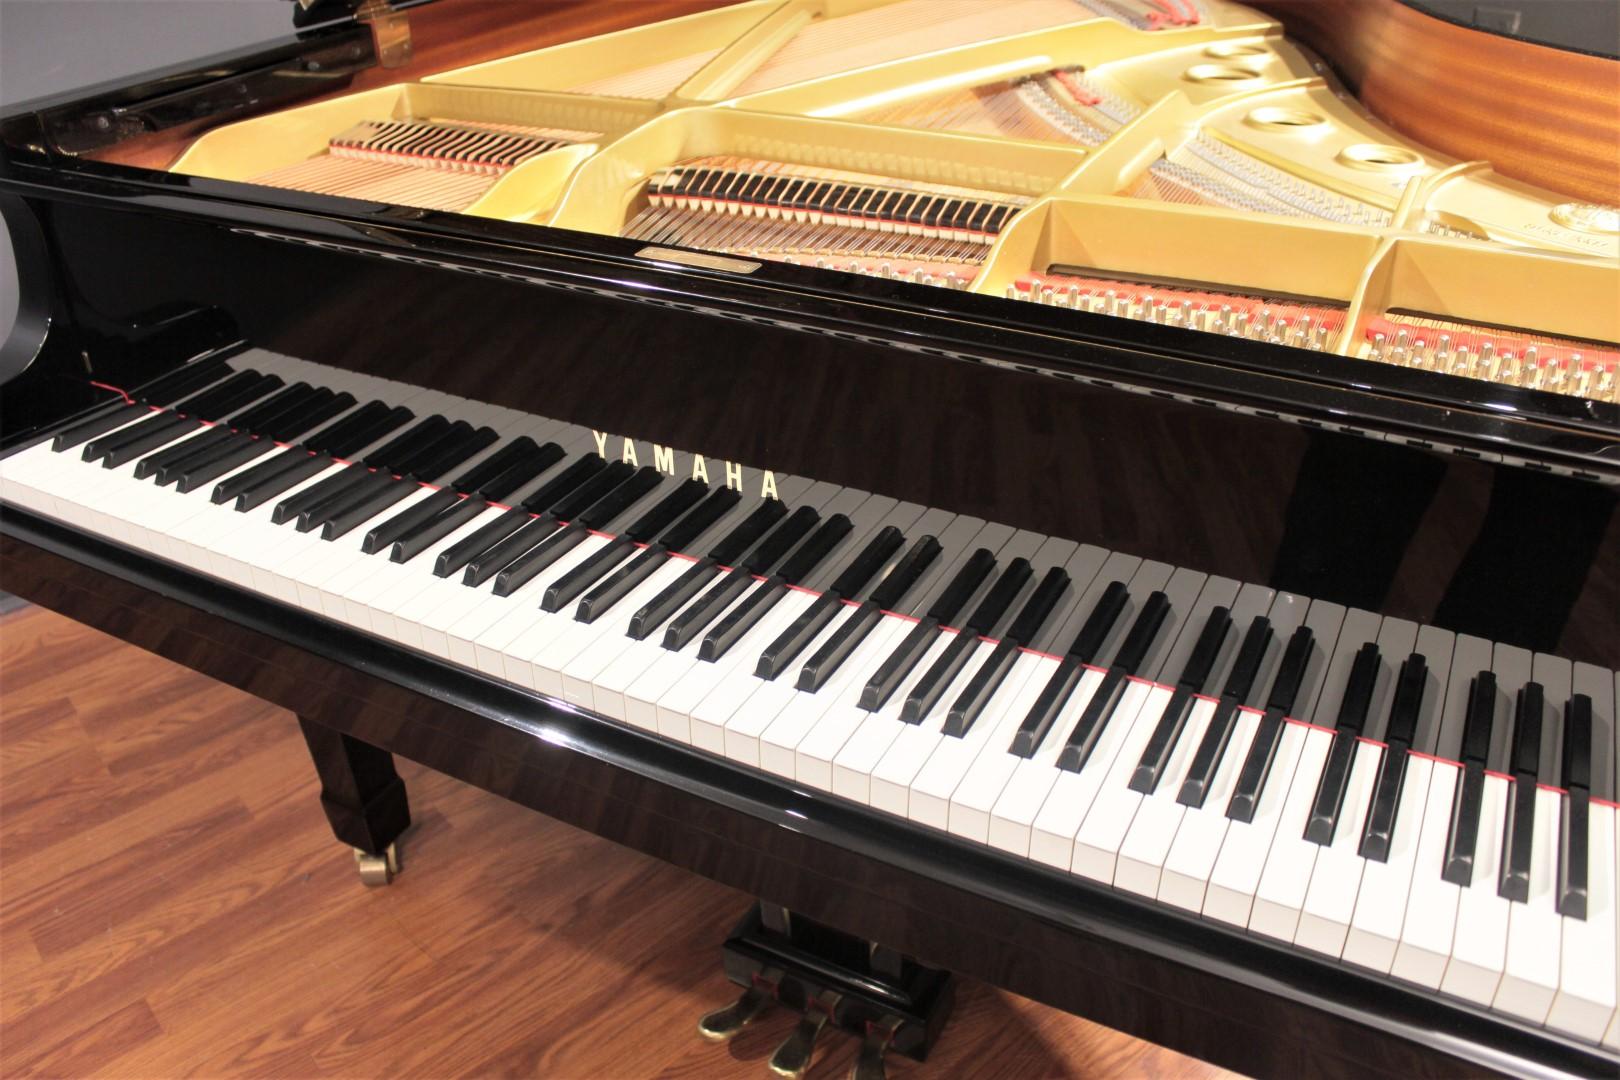 Yamaha c3 6 39 1 39 39 grand piano 1987 grand pianos for Yamaha c3 piano